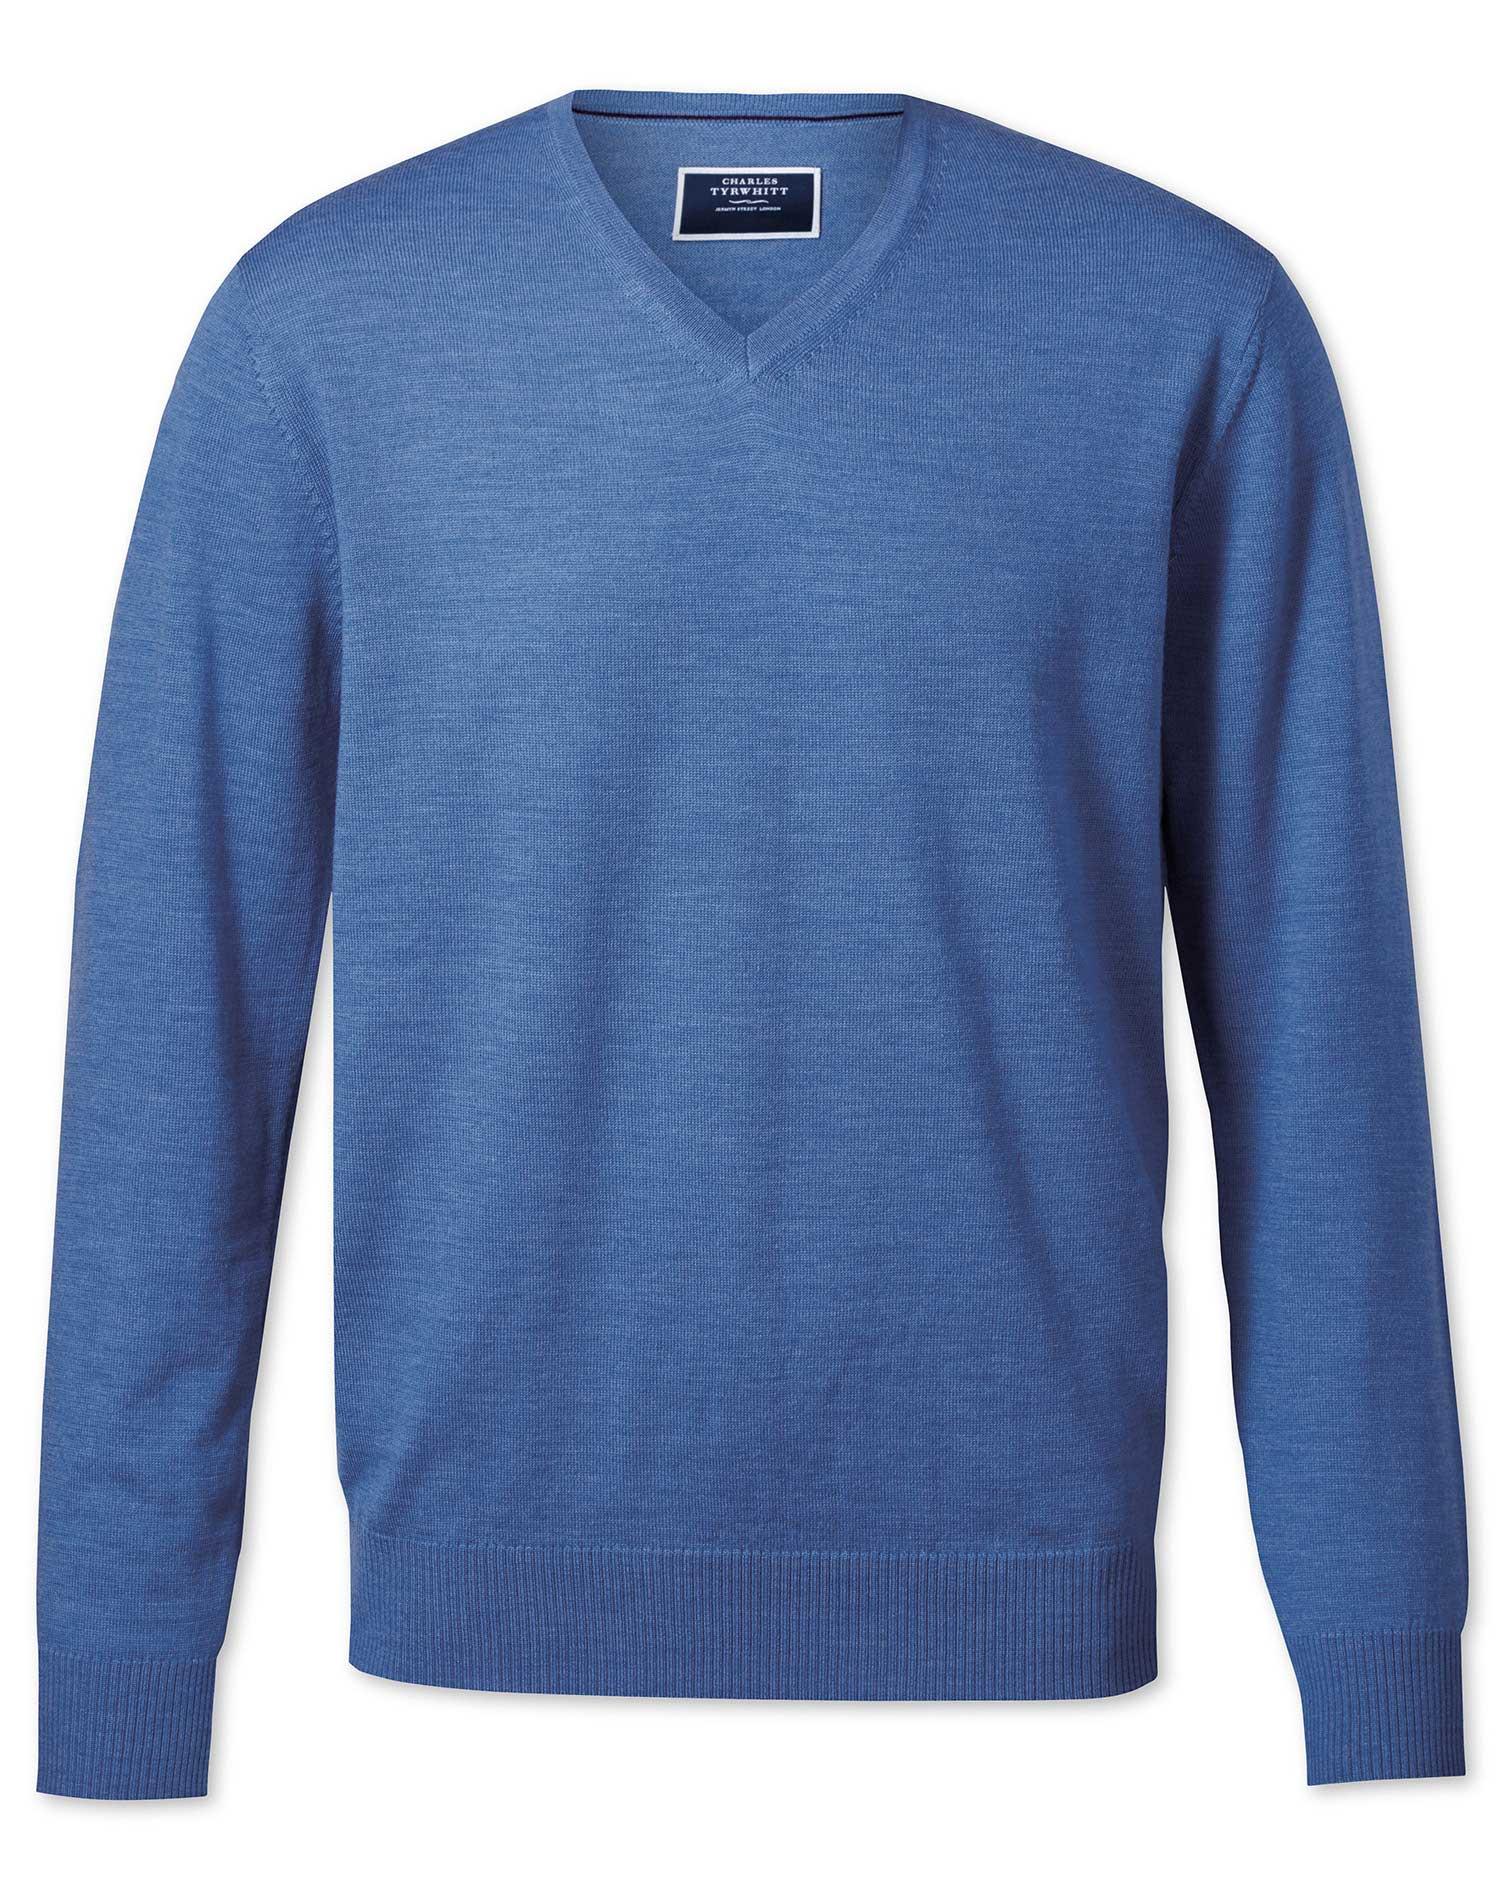 Blue Merino Wool V-Neck Jumper Size XS by Charles Tyrwhitt